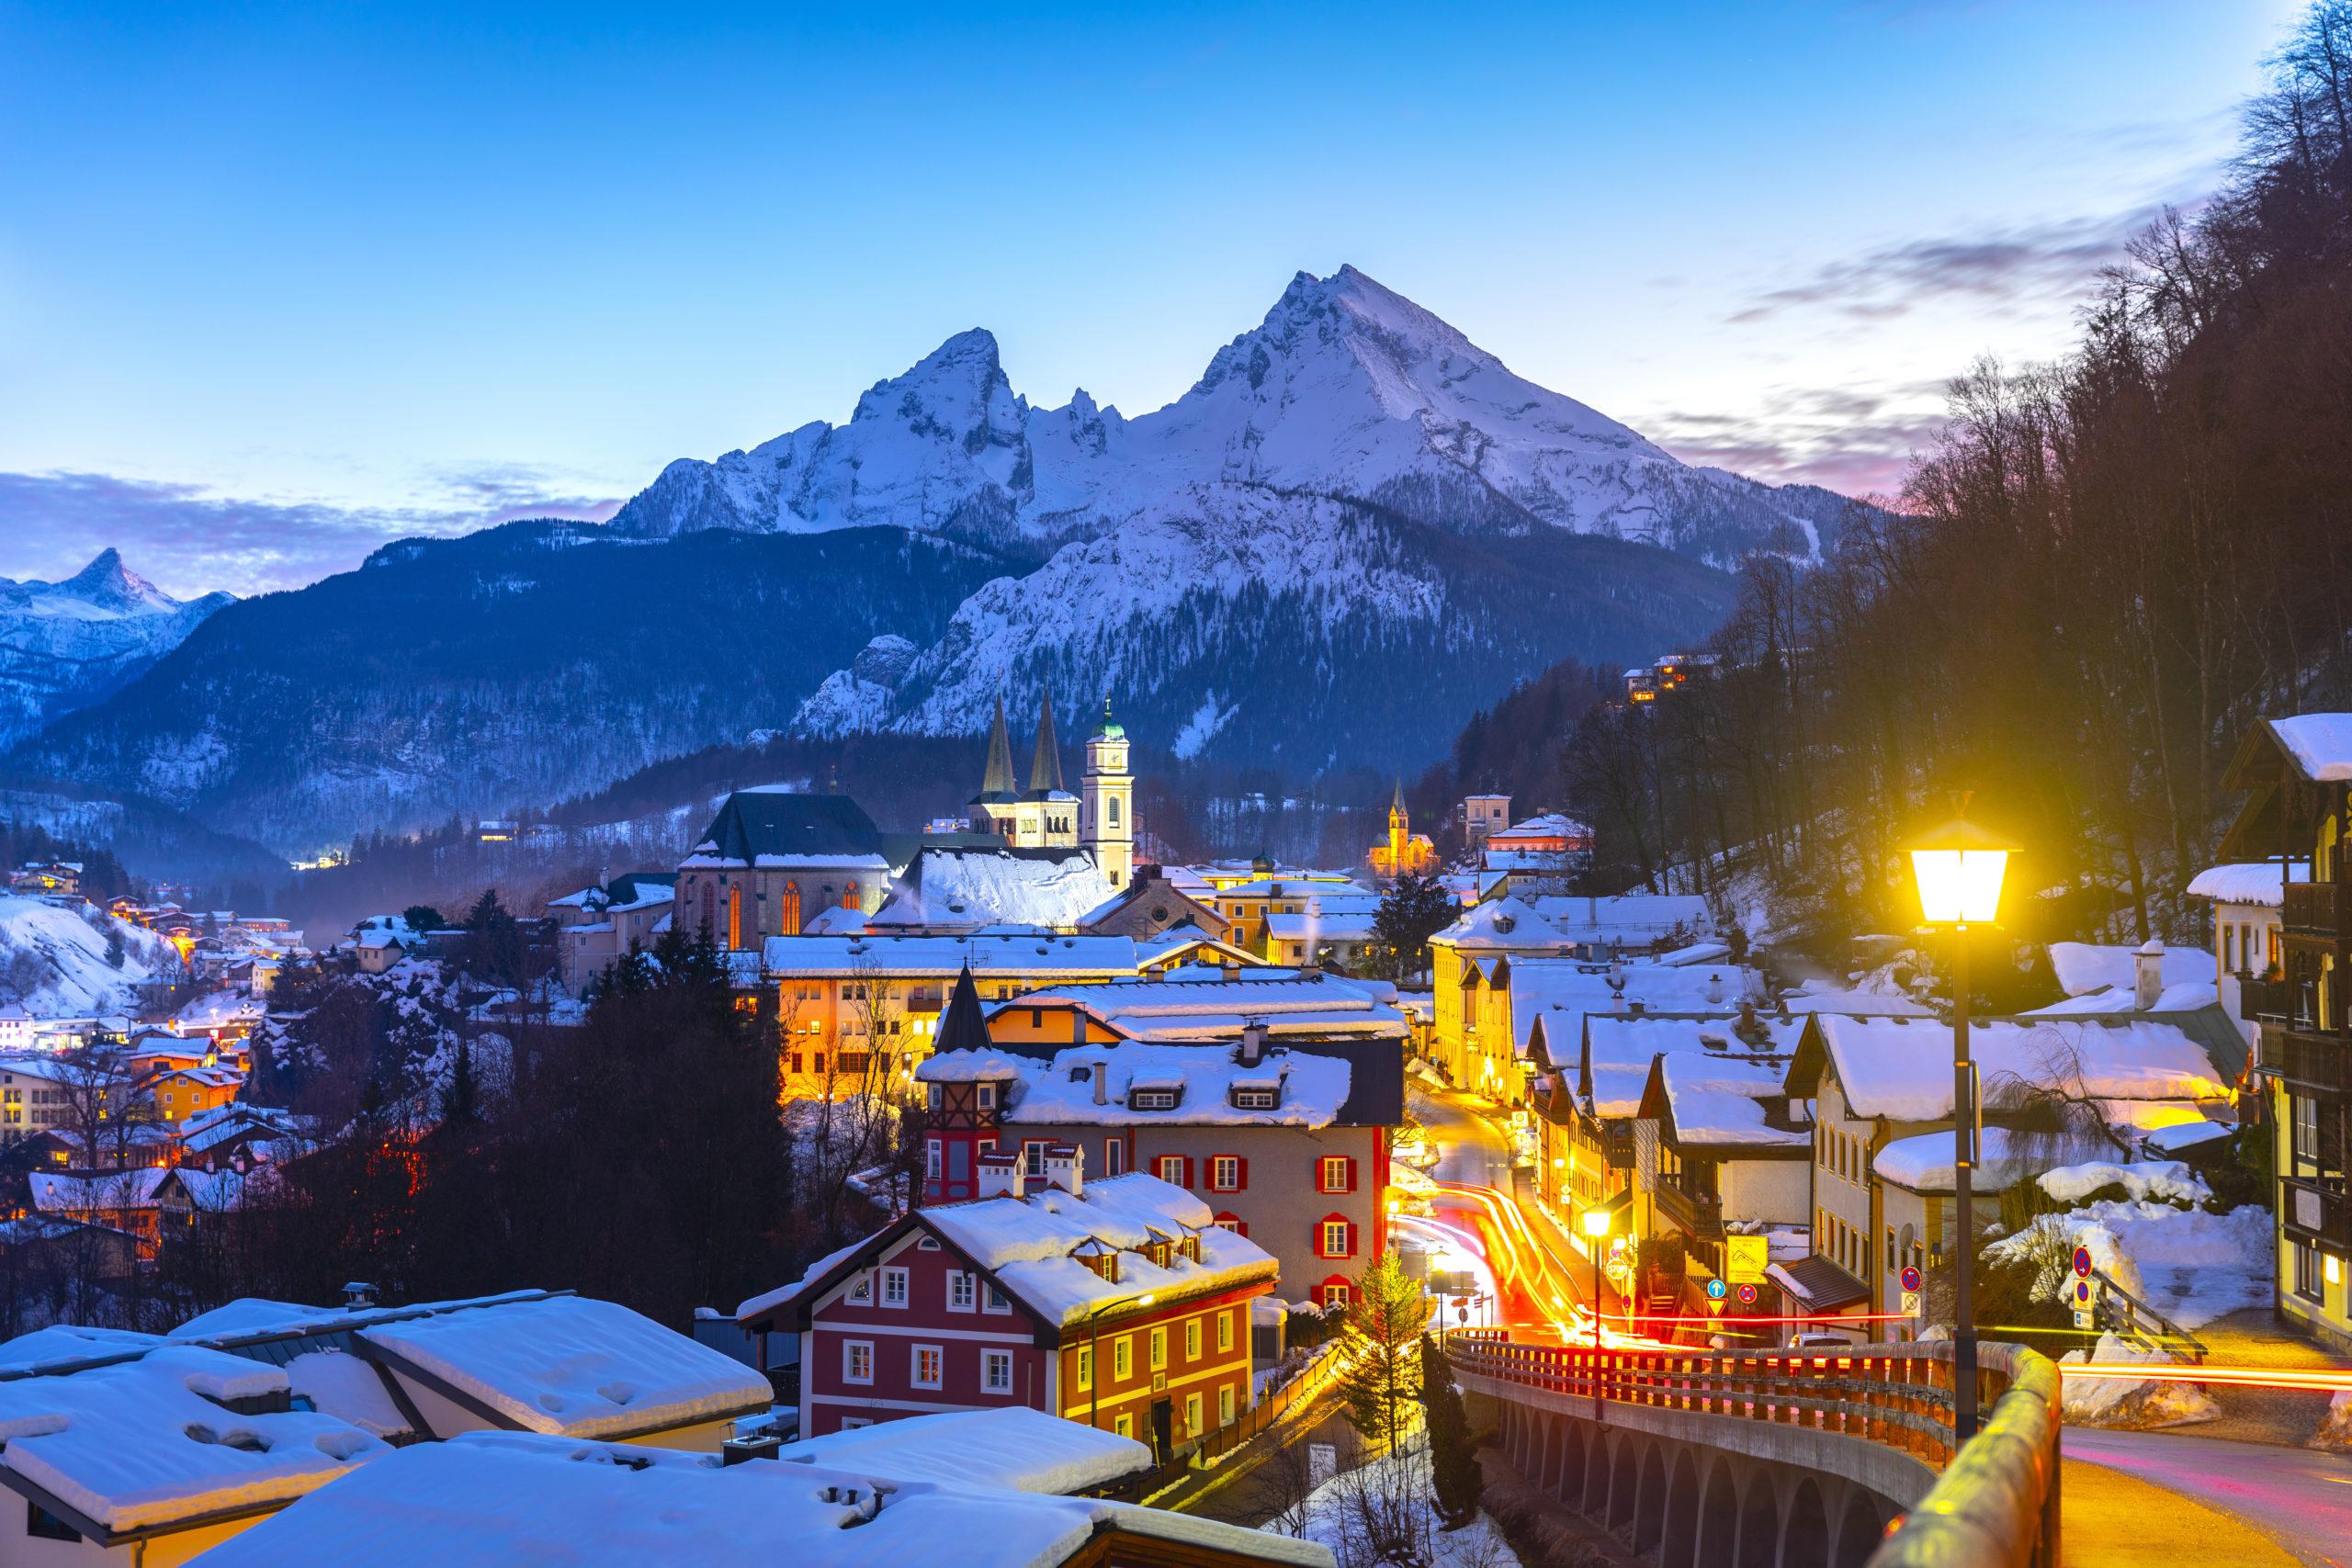 Berchtesgaden, Upper Bavaria, Germany